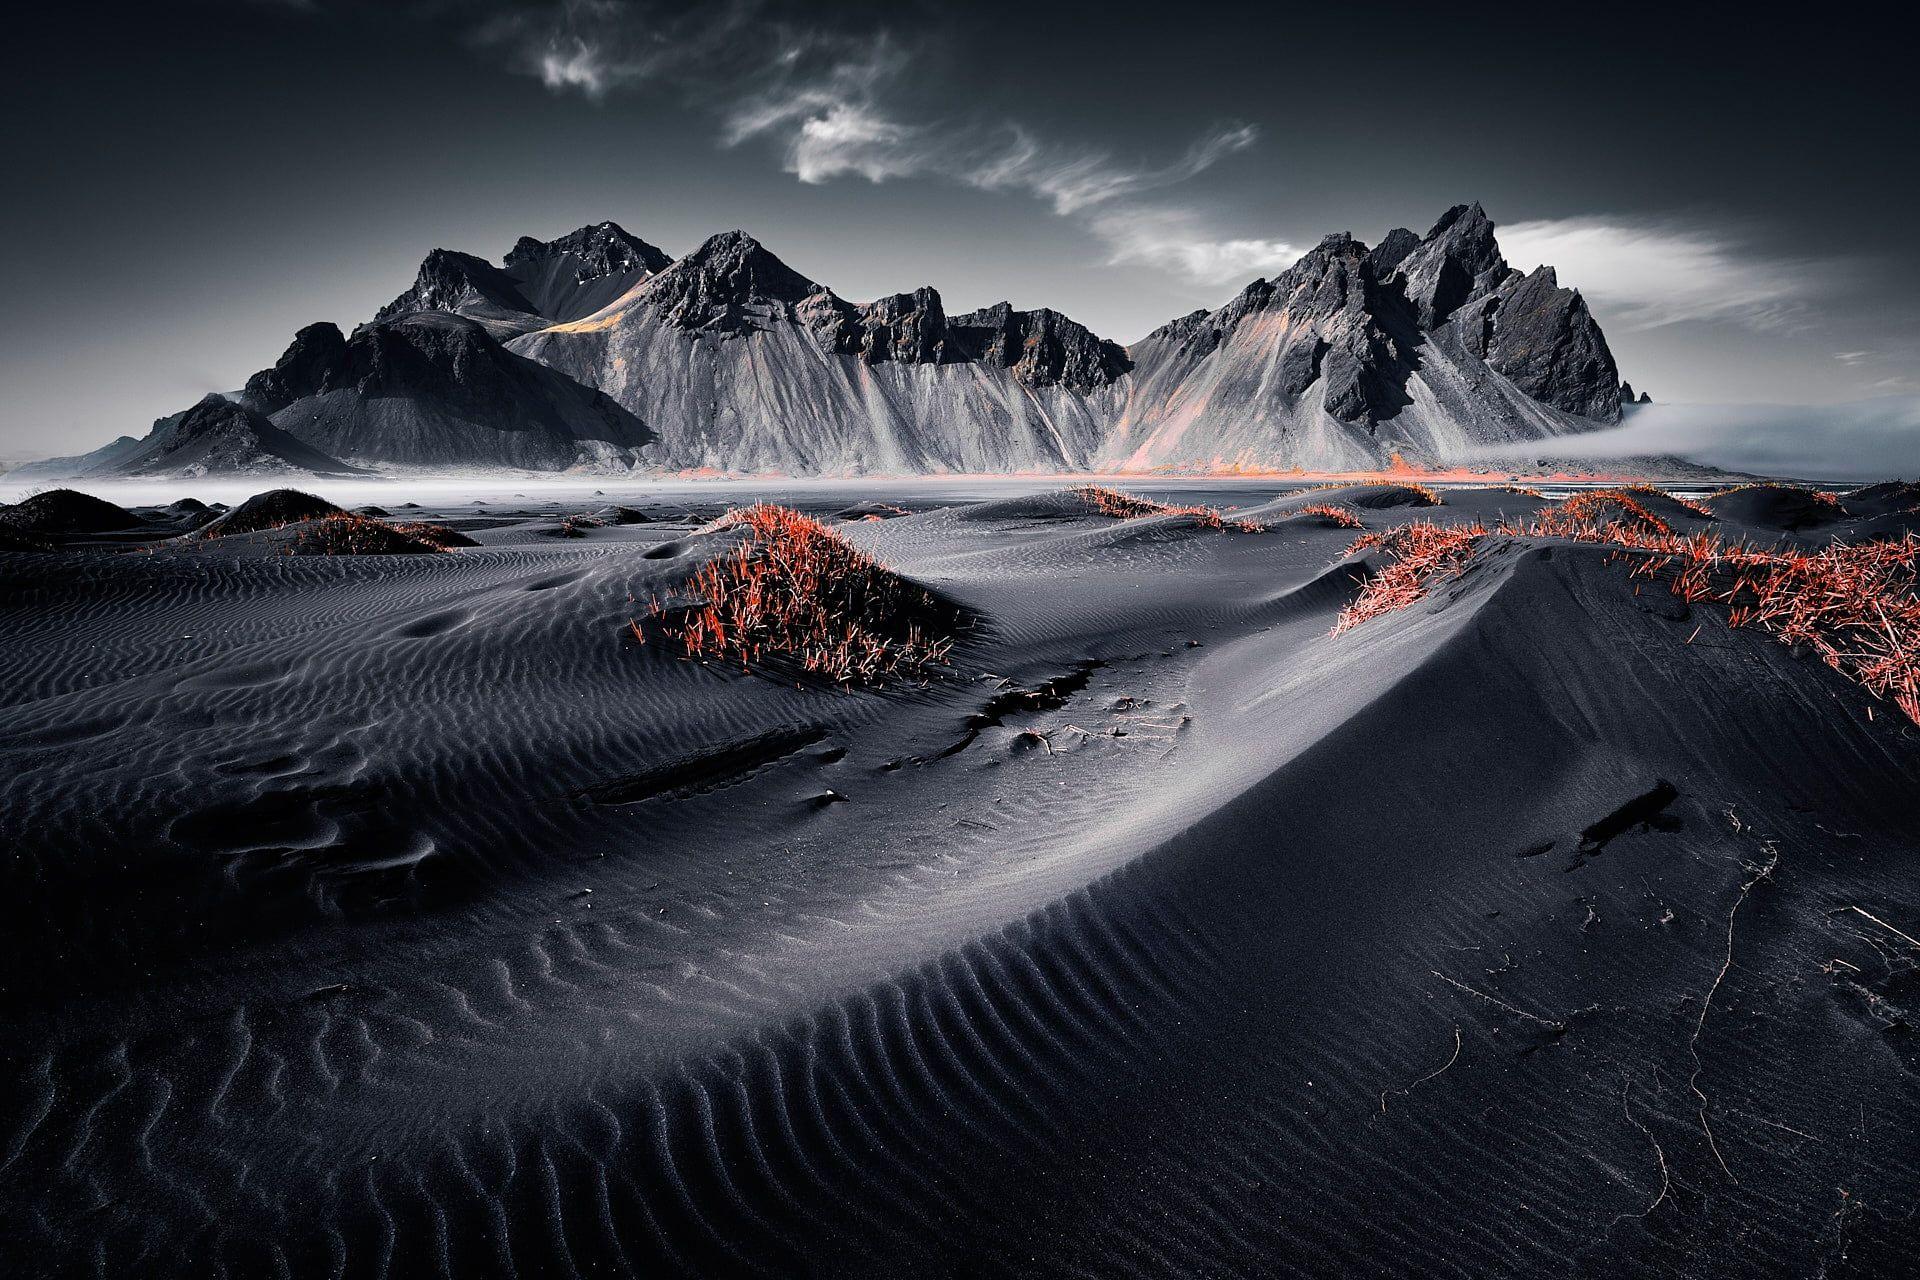 grayscale photo of desert Iceland landscape nature